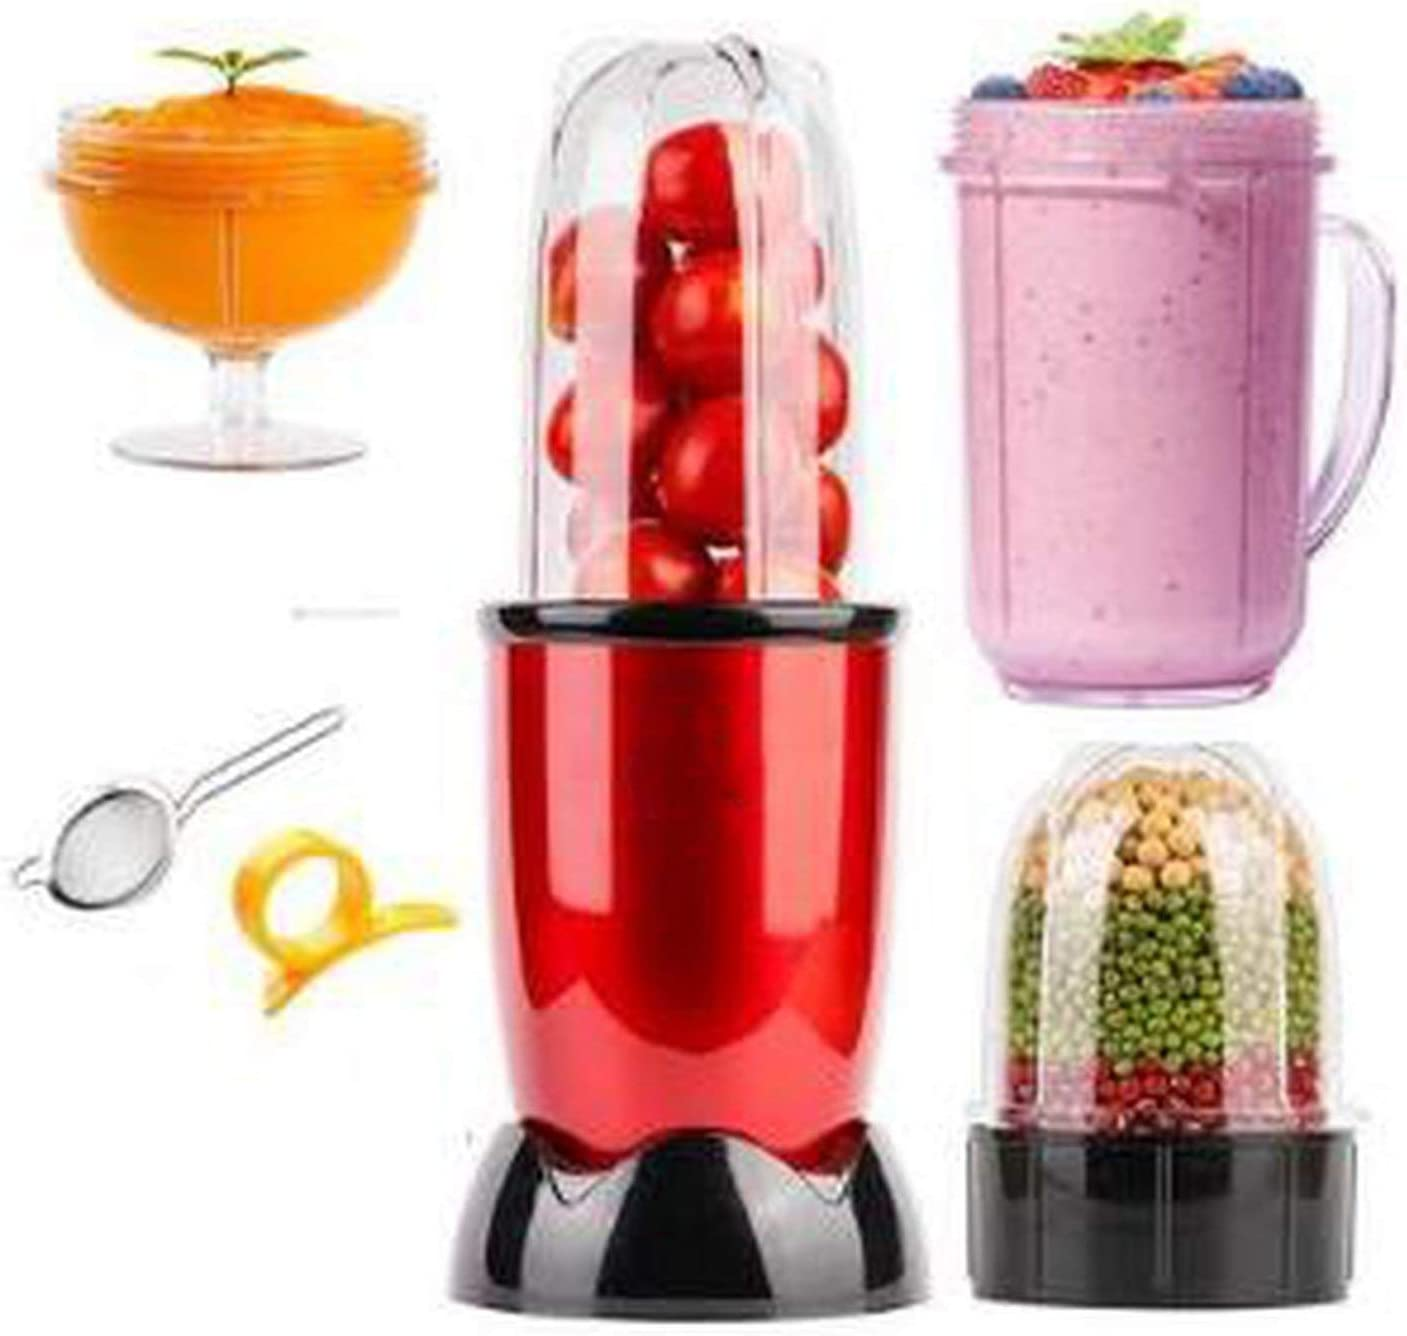 220V Electric Juicer Mini Household Automatic Juicer Machine High Quality Mini Juicer EU/AU/UK Plug,4 cups 3 blades